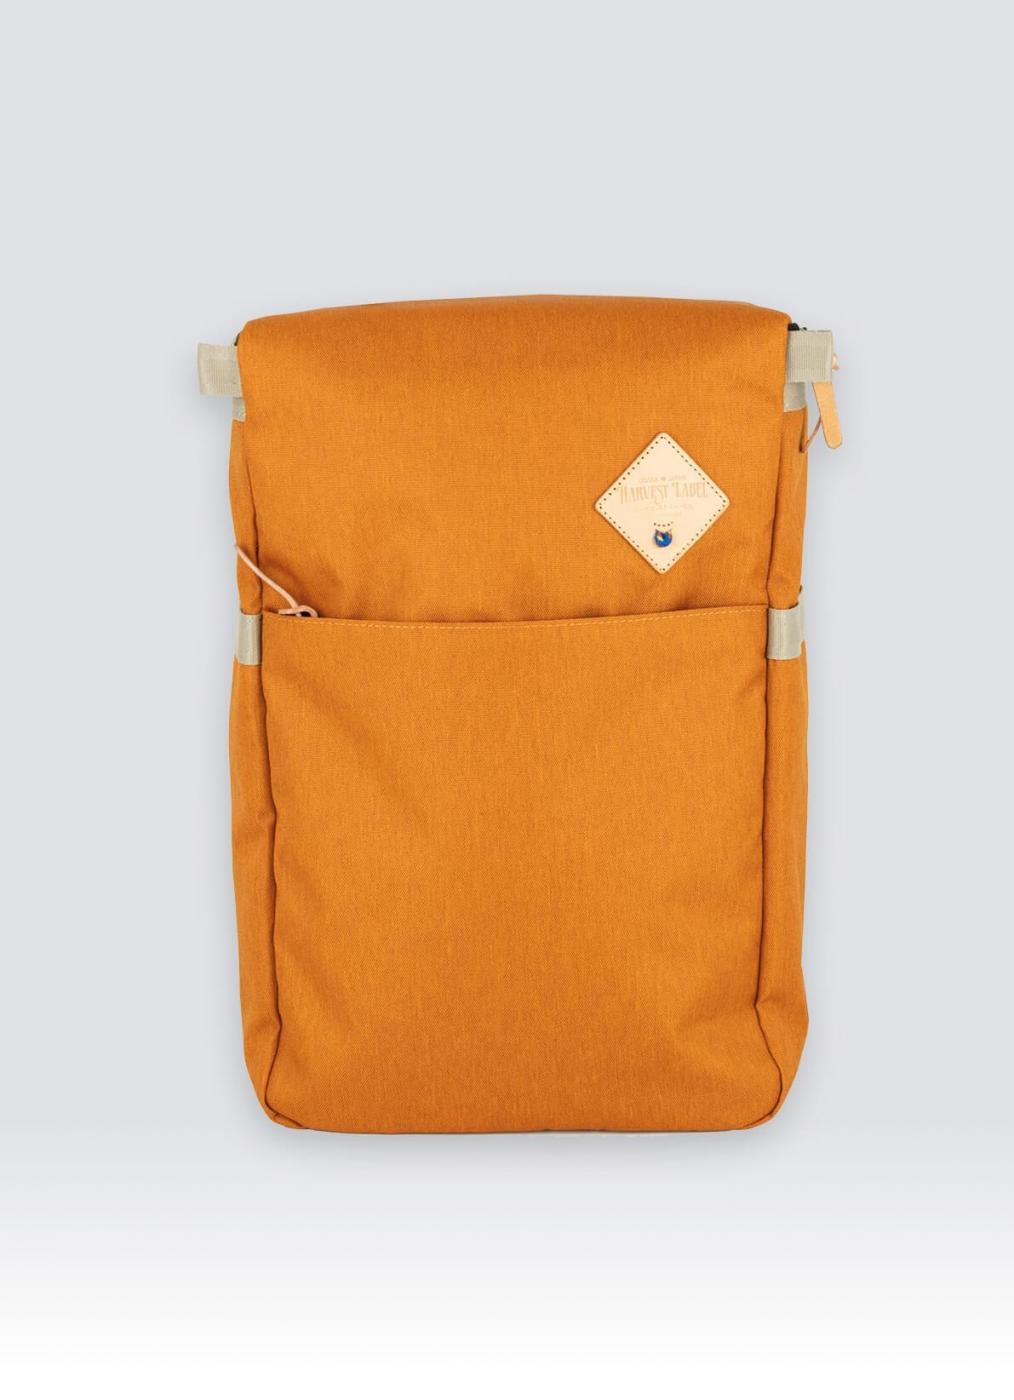 Harvest Label Harvest Label Dewa Rugzak - 13″ Cordura® polyester - Orange